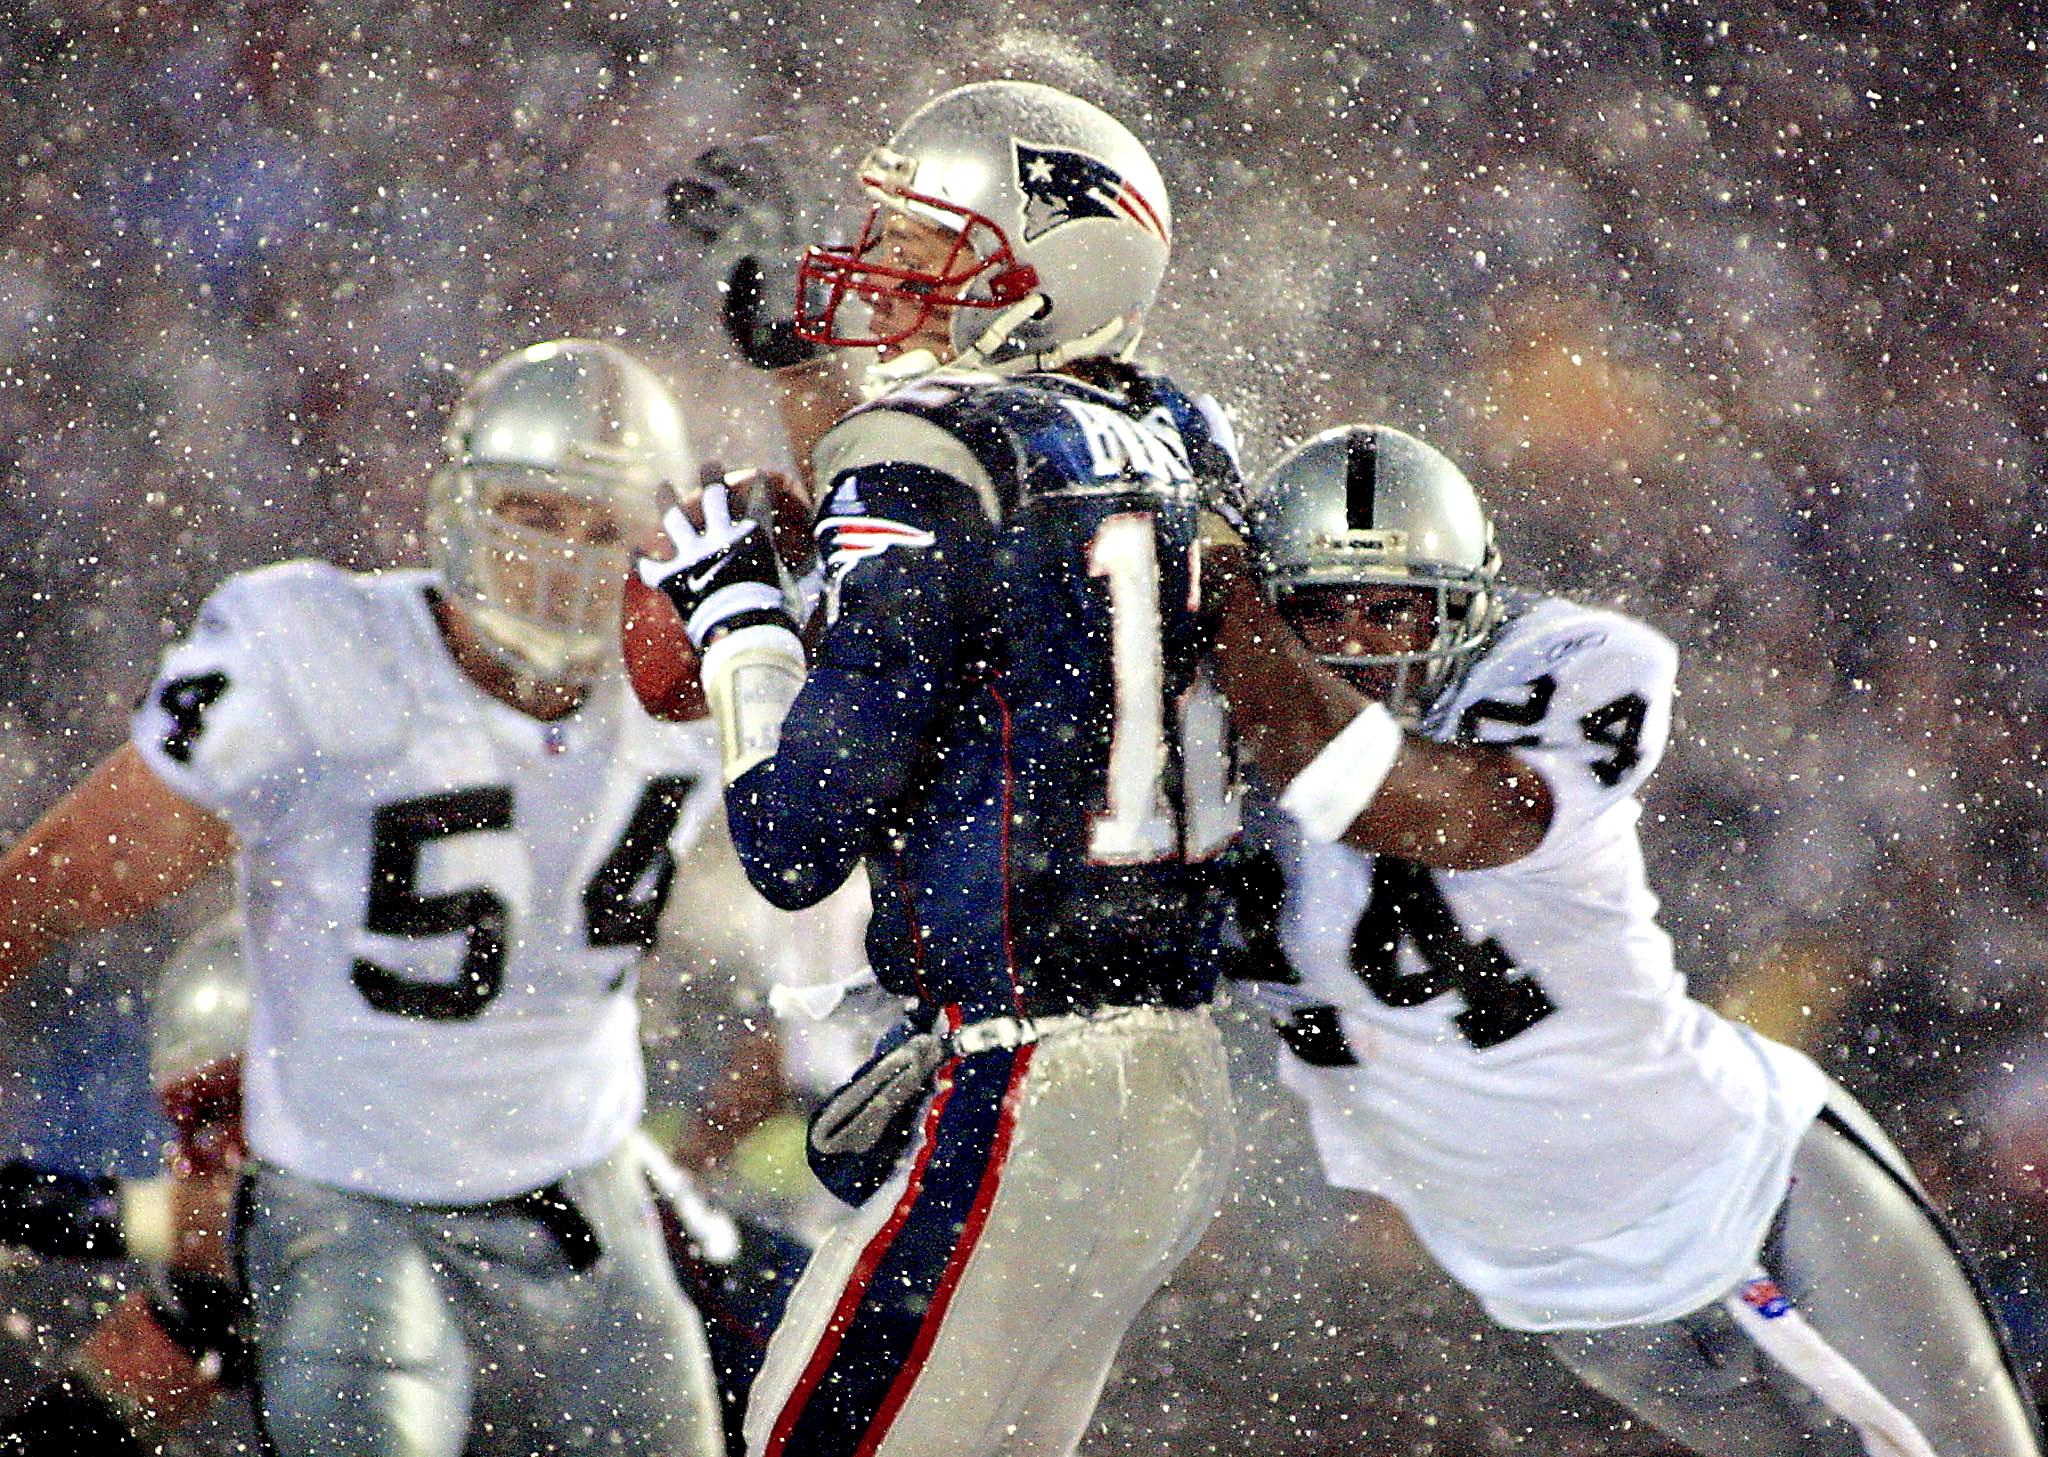 2001 Patriots and Raiders